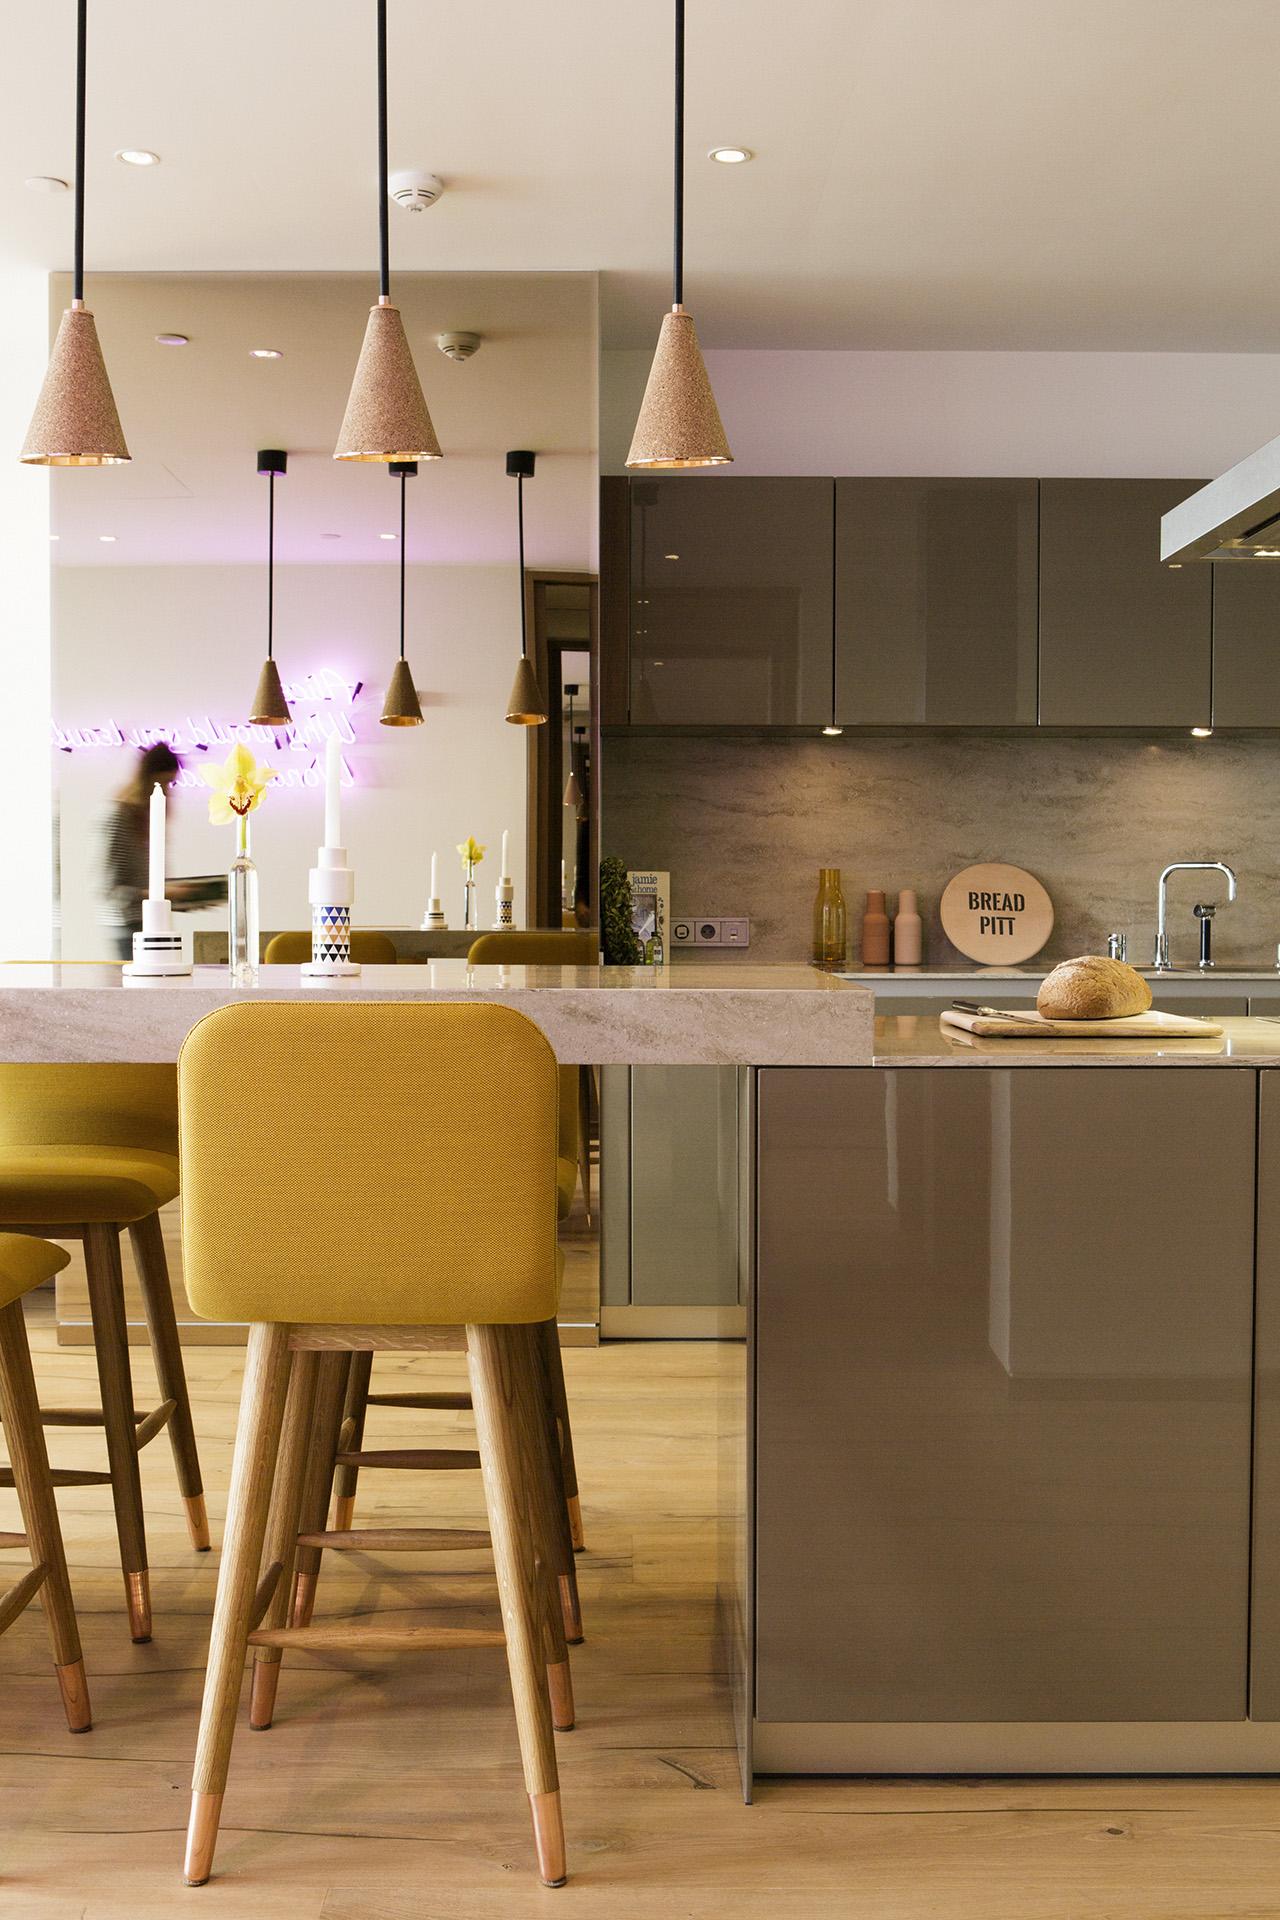 Mistral bar stools, lanterna ceiling lamps and custom designed kitchen.